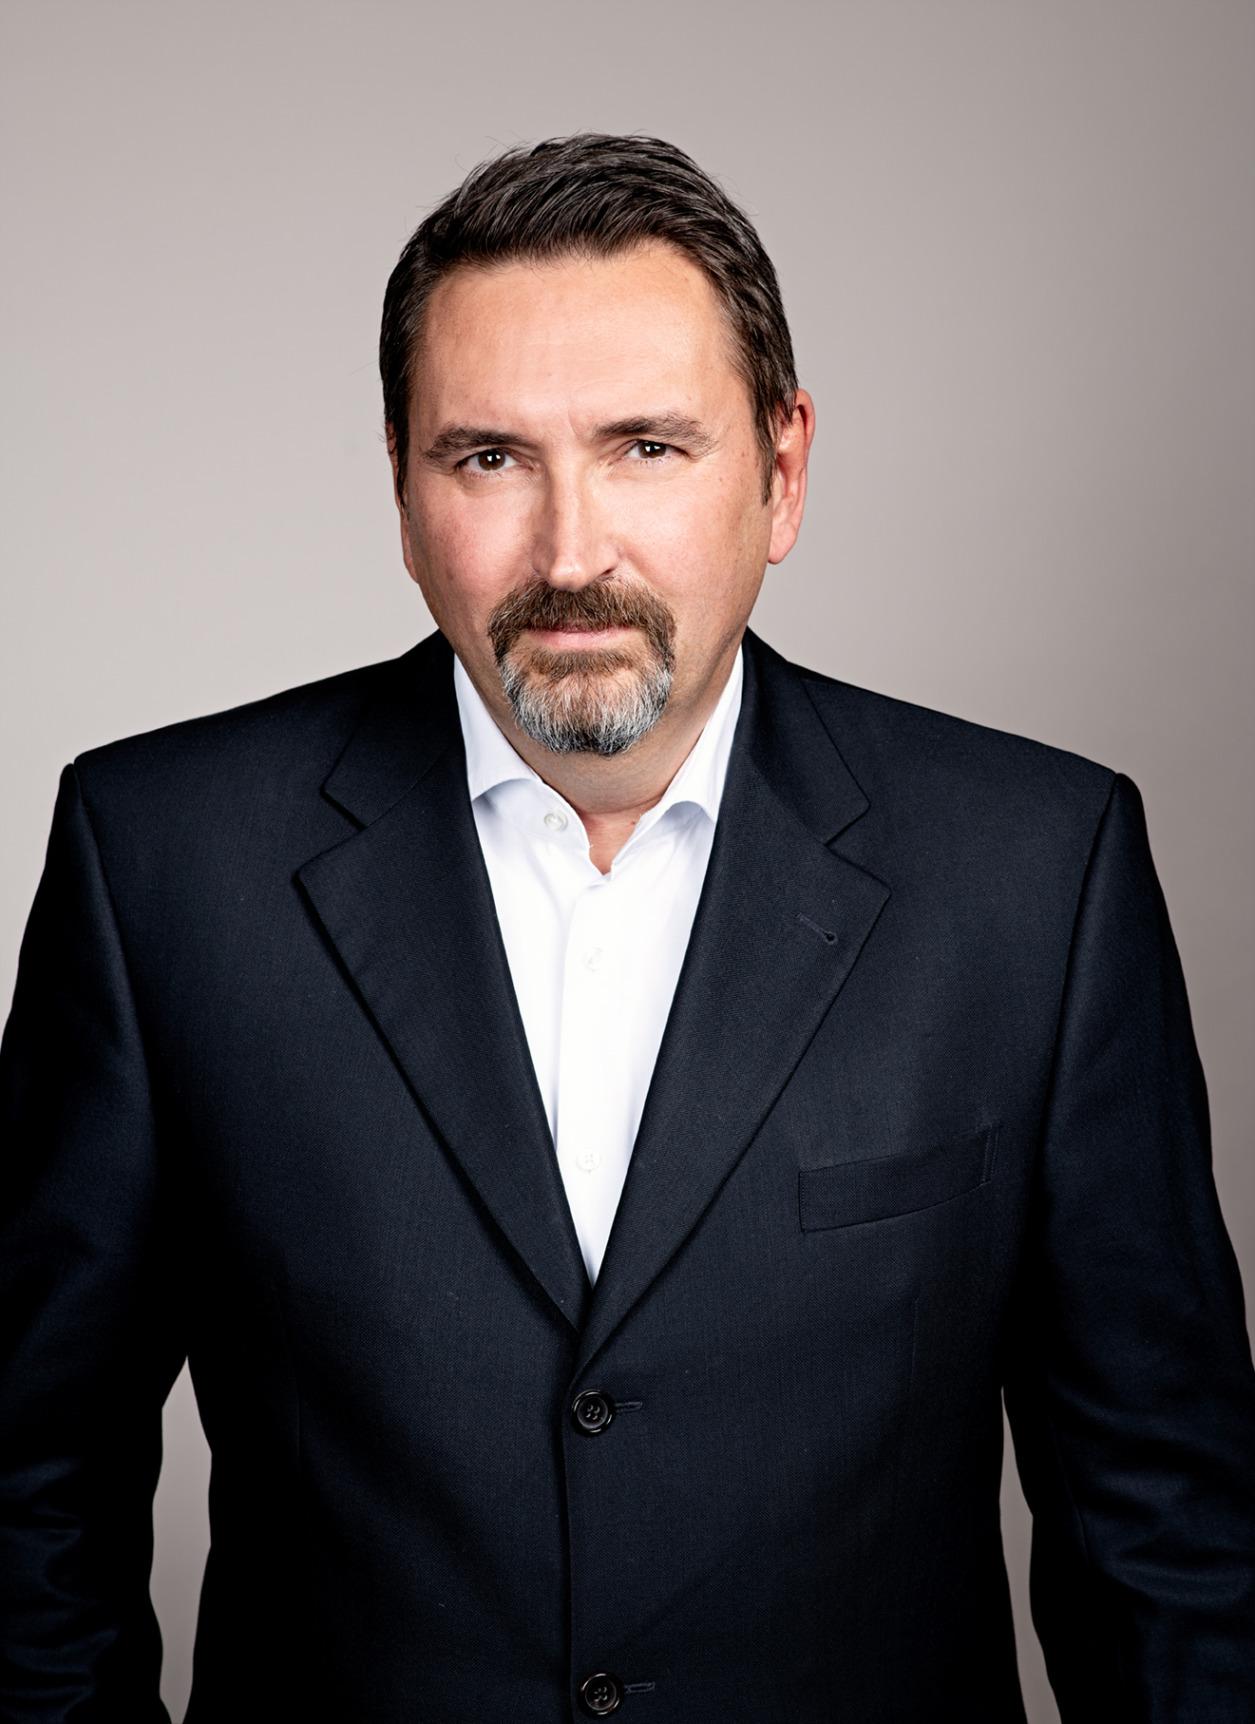 Dr. Christian Breuer